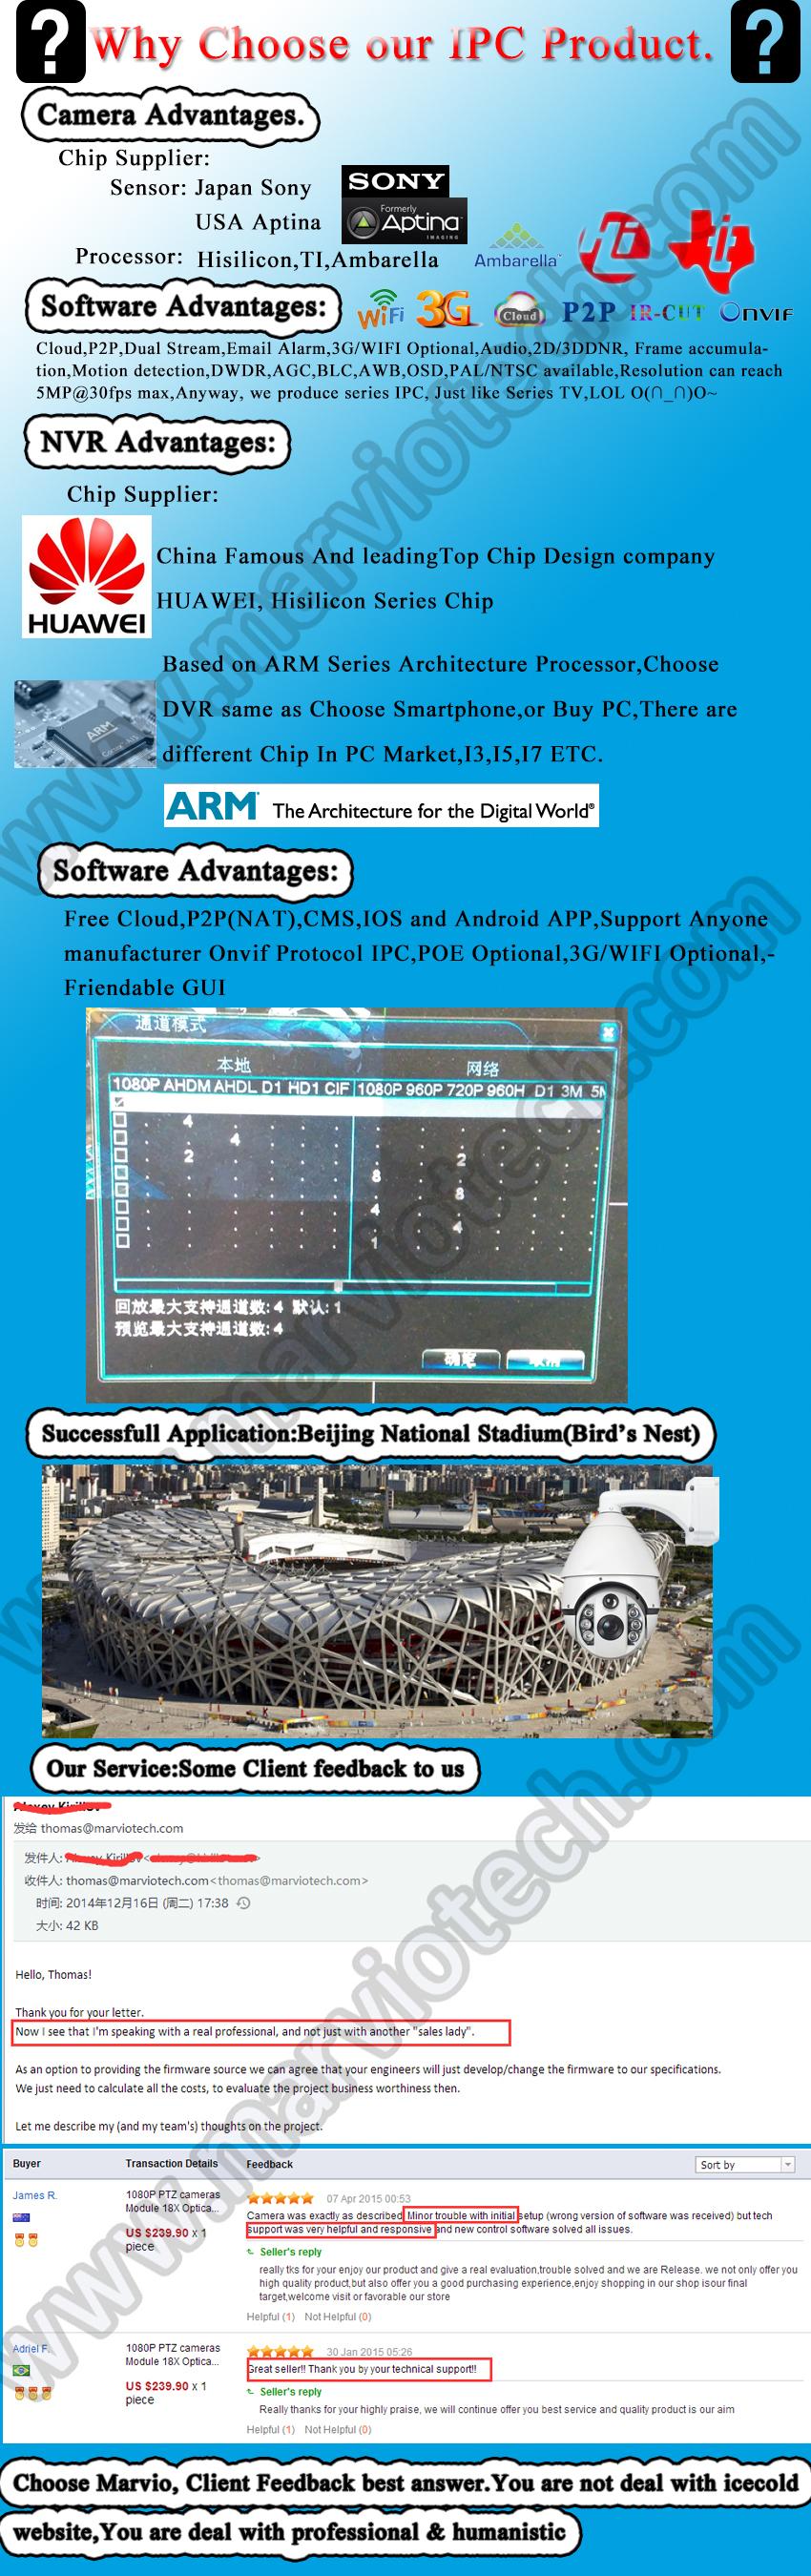 Marvio Mini Ip Ptz371005 Series Hi3516c Dahua Auto Tracking Ptz Hd ...